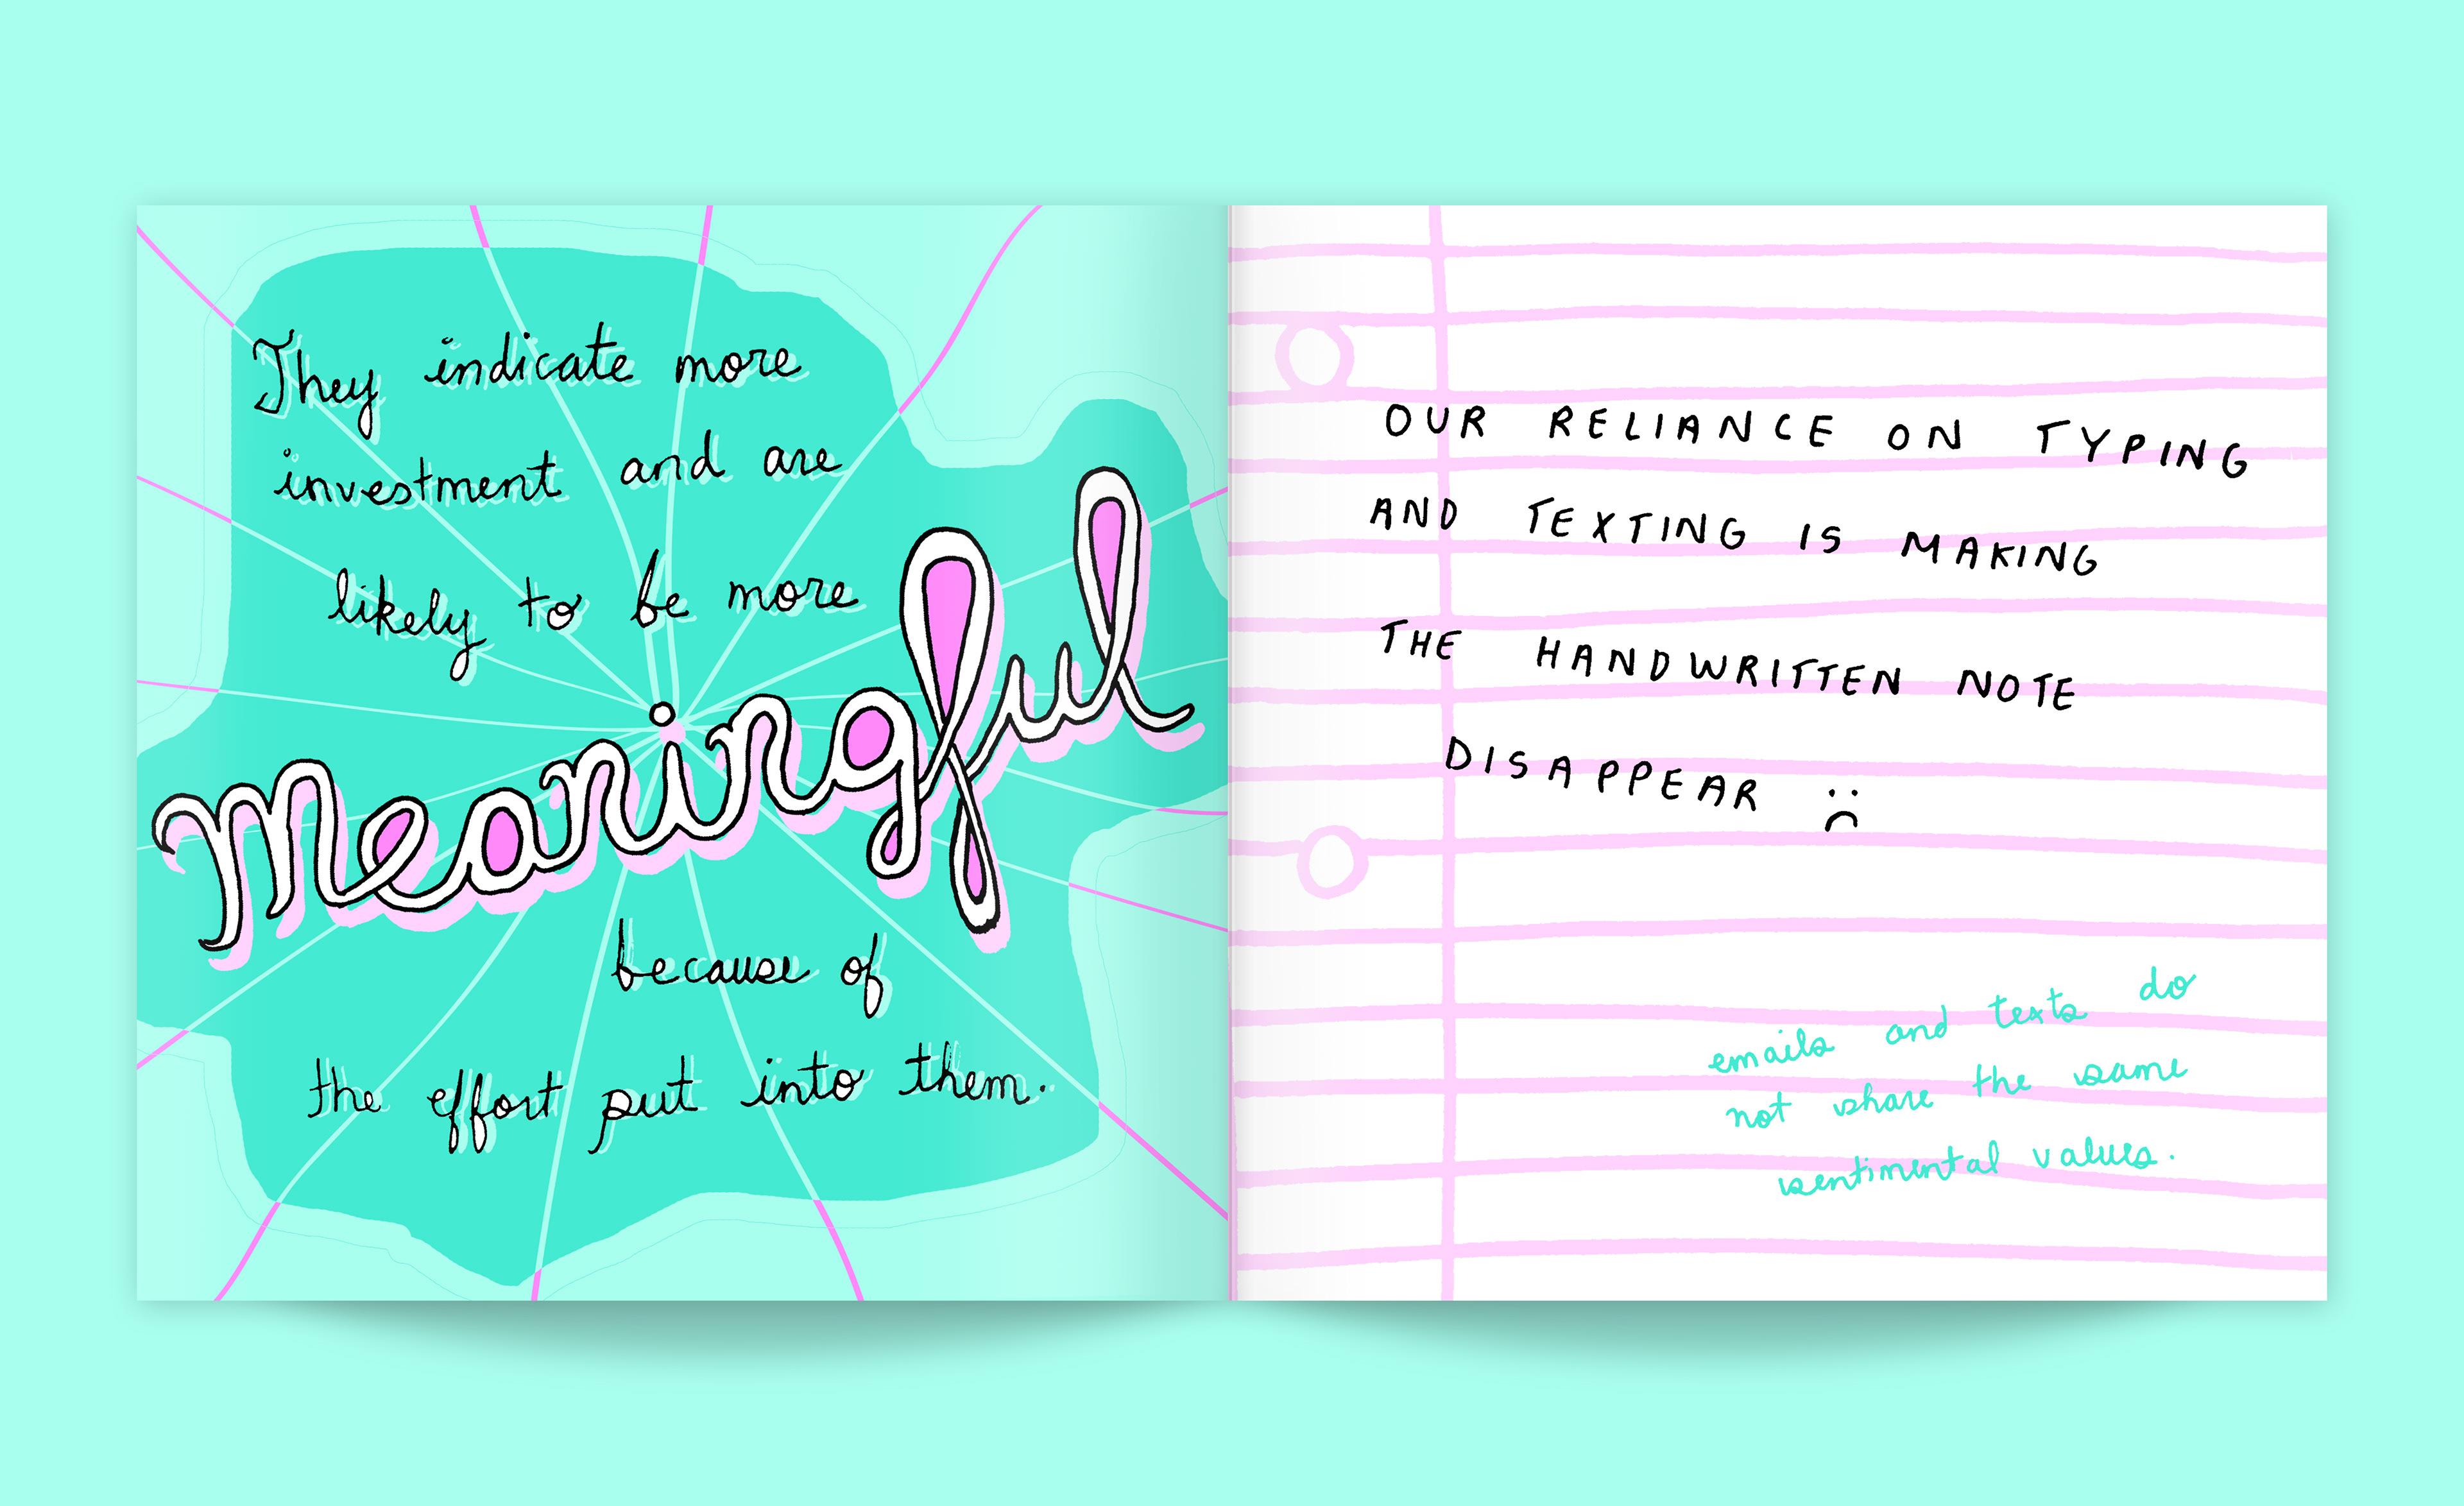 Jane Gardner Design - The Lost Art of Handwritten Communication